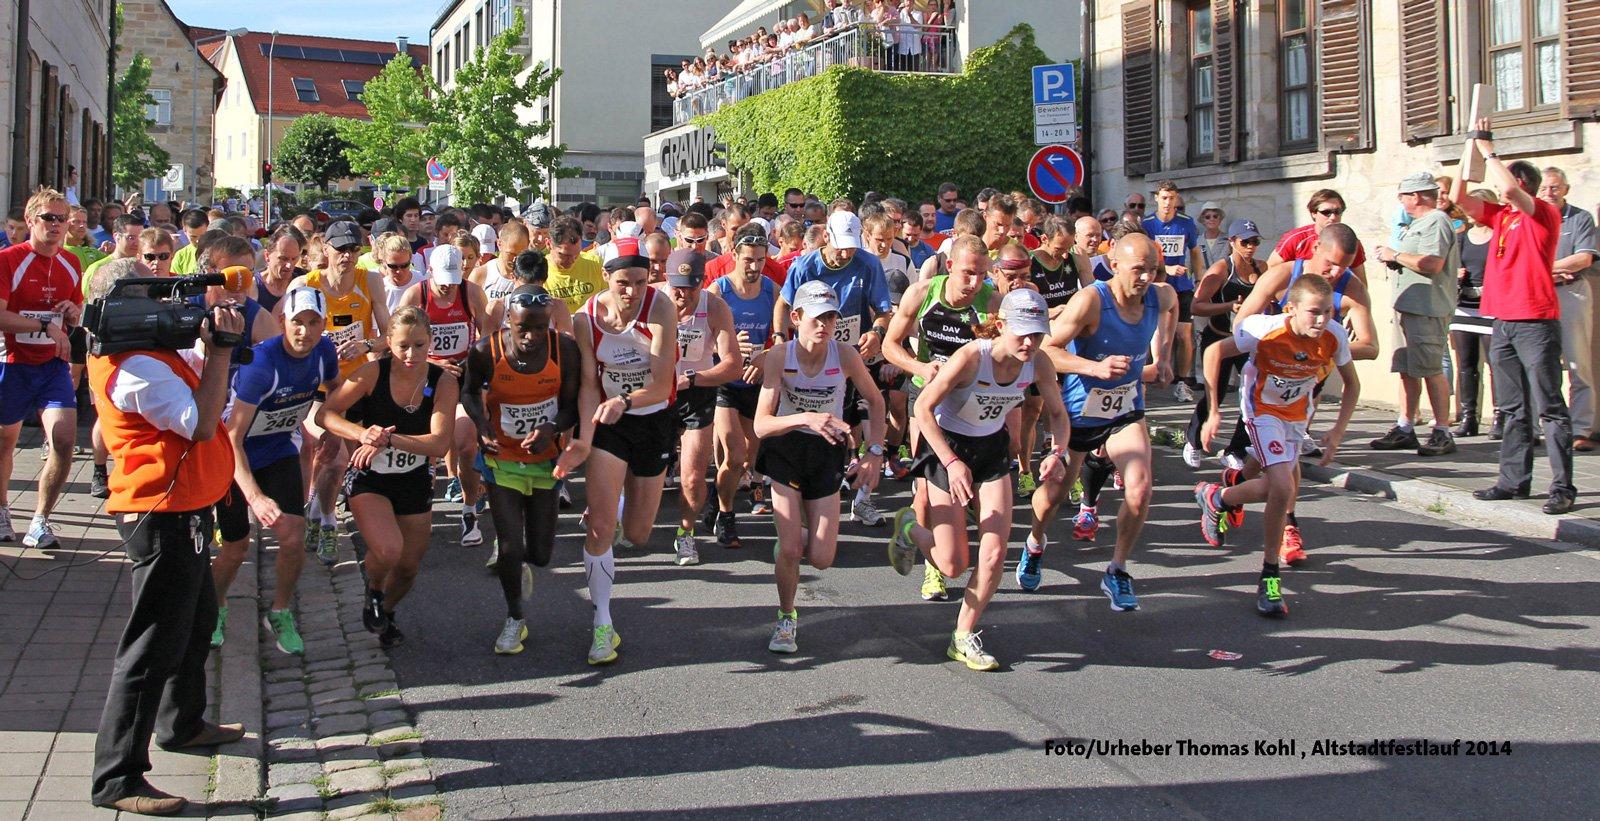 Zum 20. Mal: Jubiläums-Altstadtfestlauf startet am 22.6.2018, 18 Uhr in Lauf, Nürnberger Tor. Archivbild Thomas Kohl.